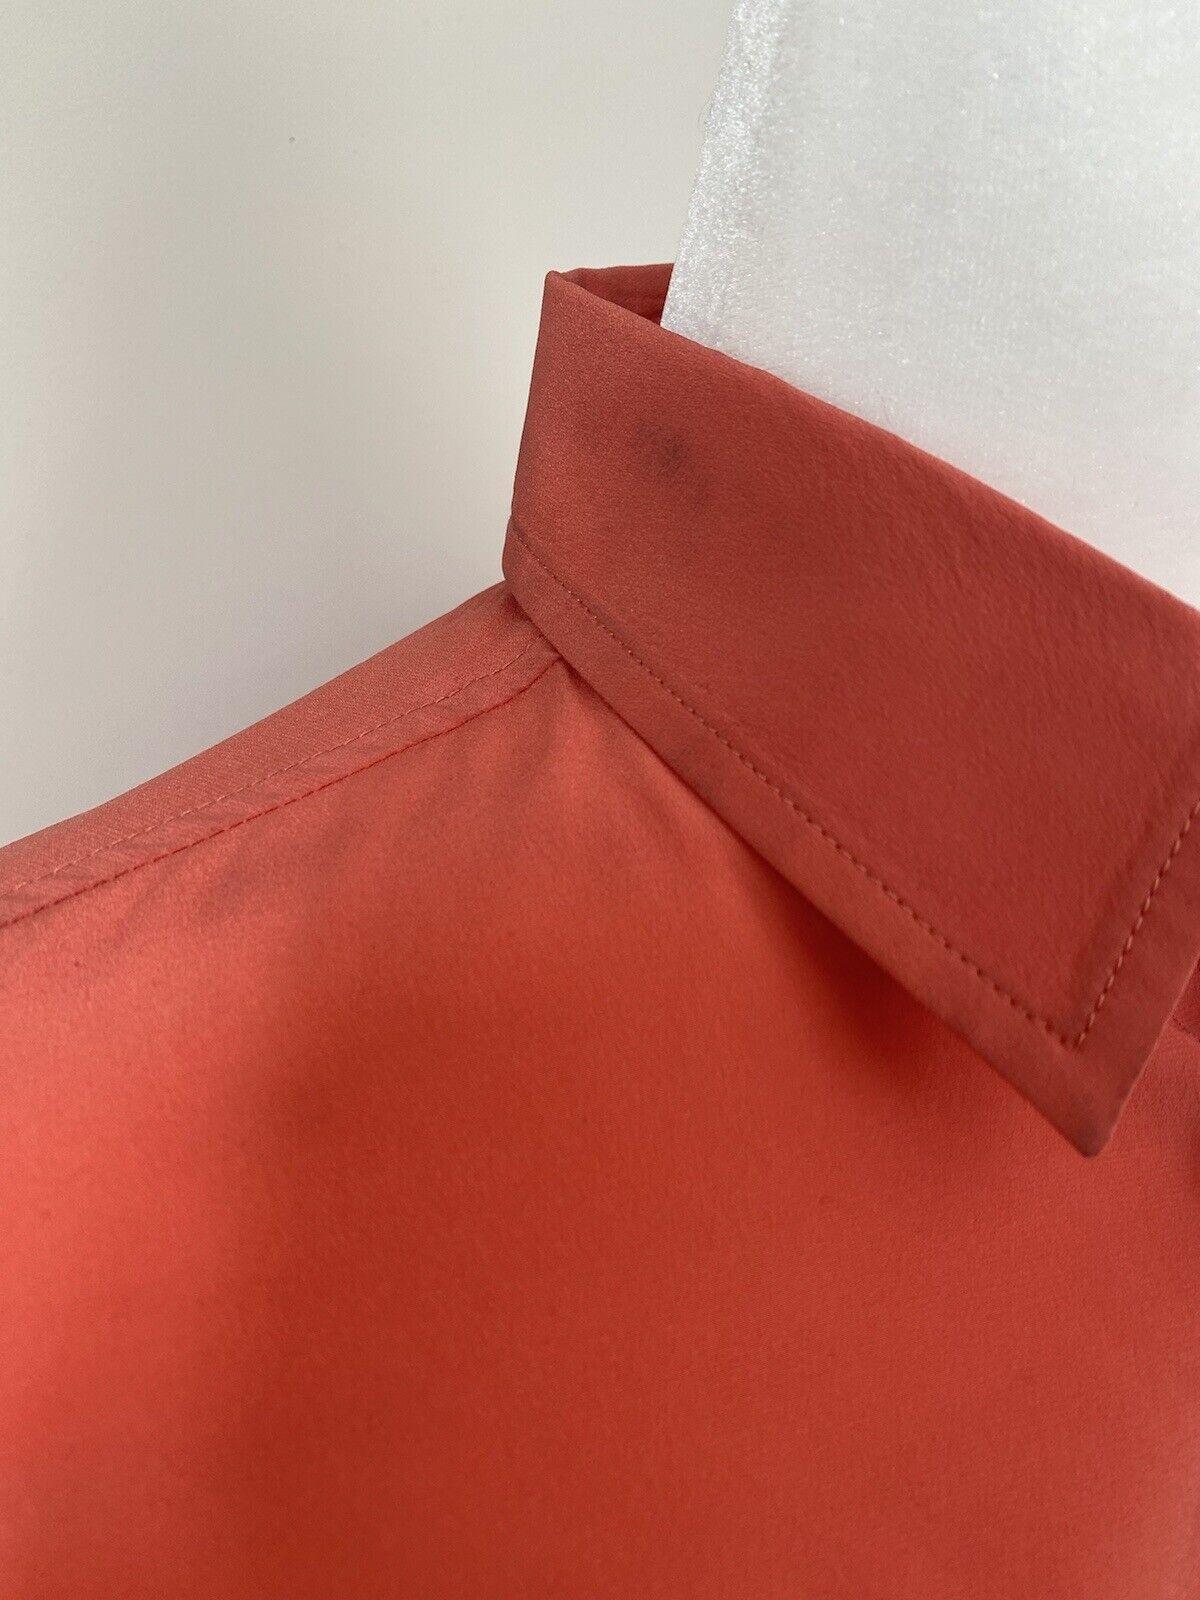 rag and bone silk blouse - image 4